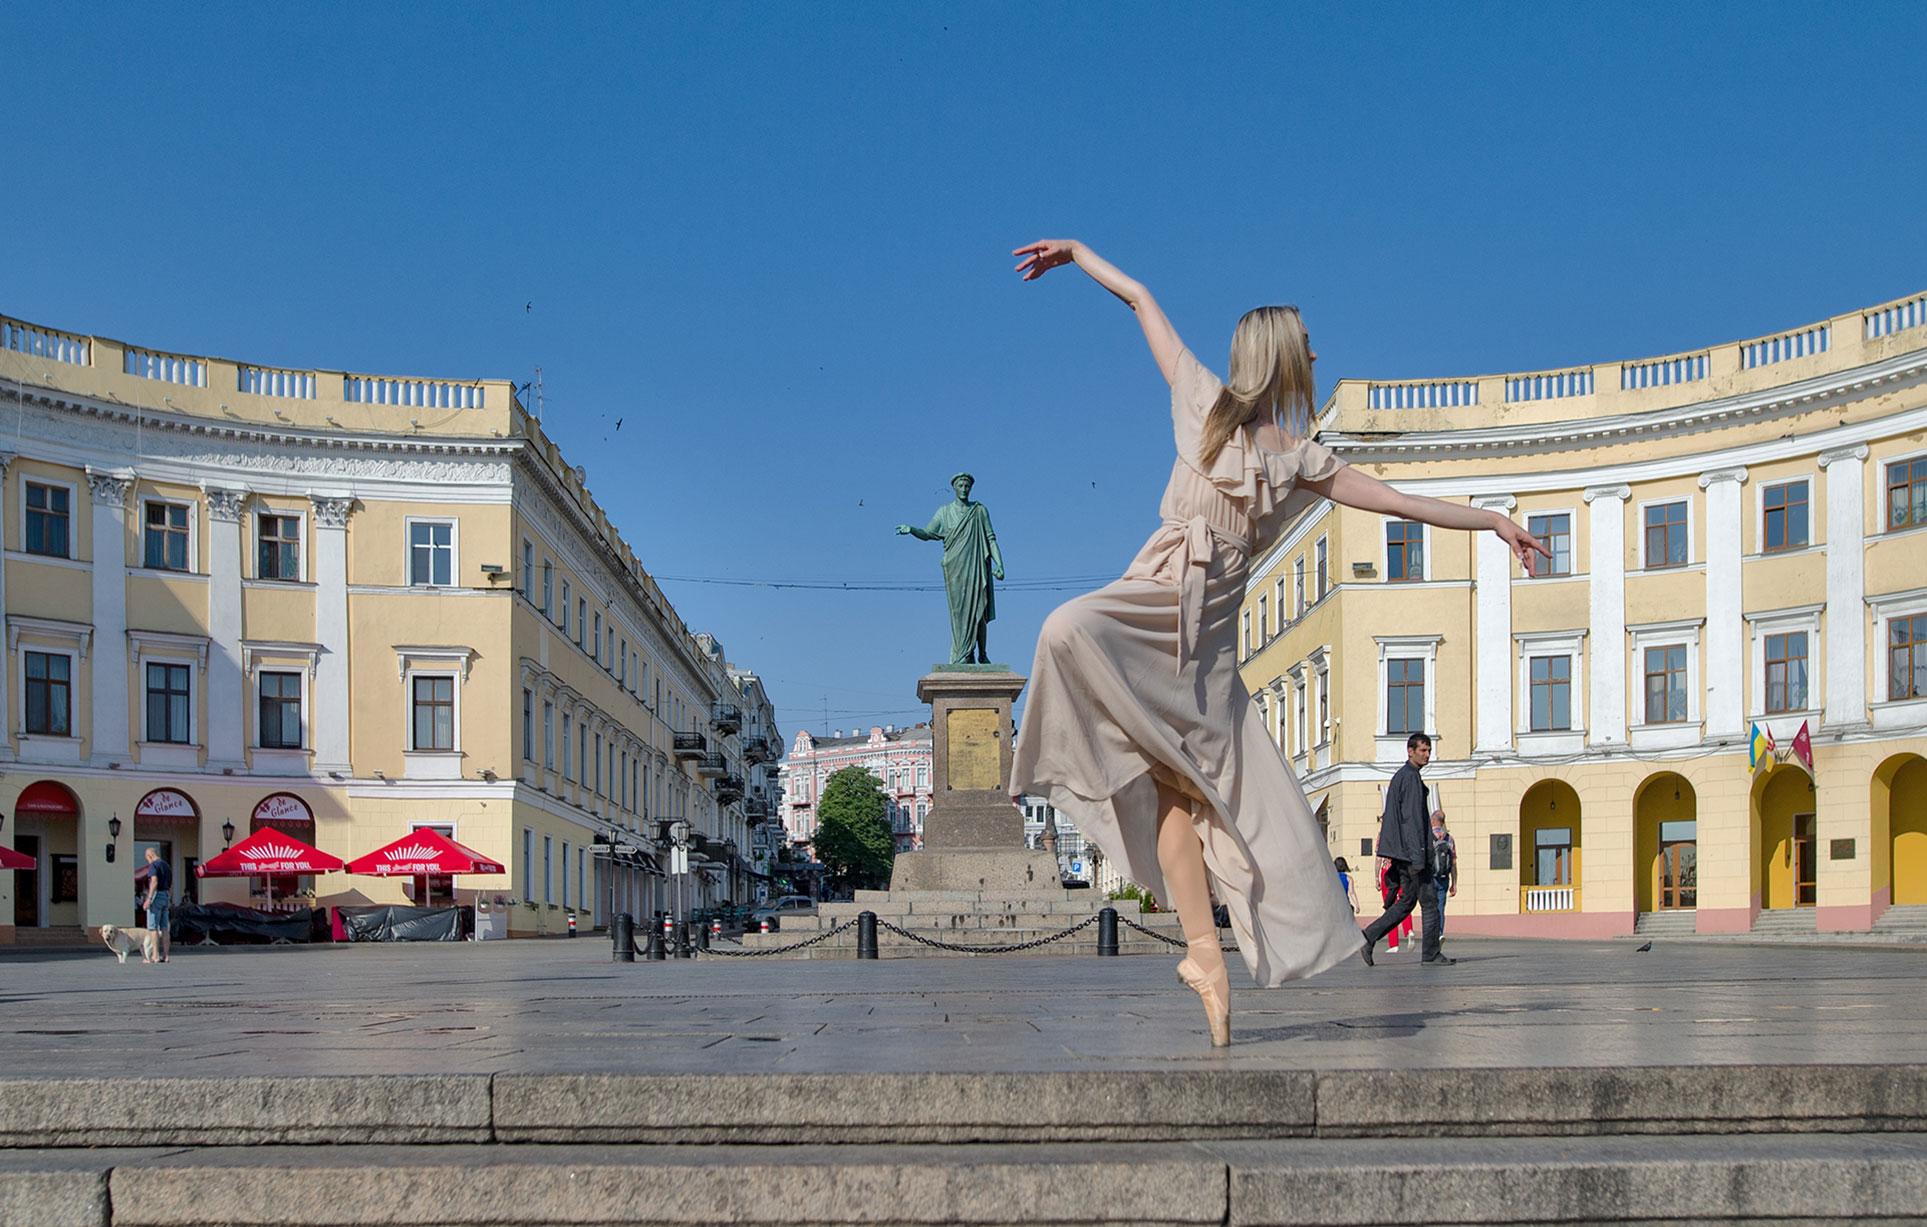 Танцующая Одесса - артисты труппы одесского театра оперы и балета танцуют на улицах города / Odessa City Ballet by Andrey Stanko